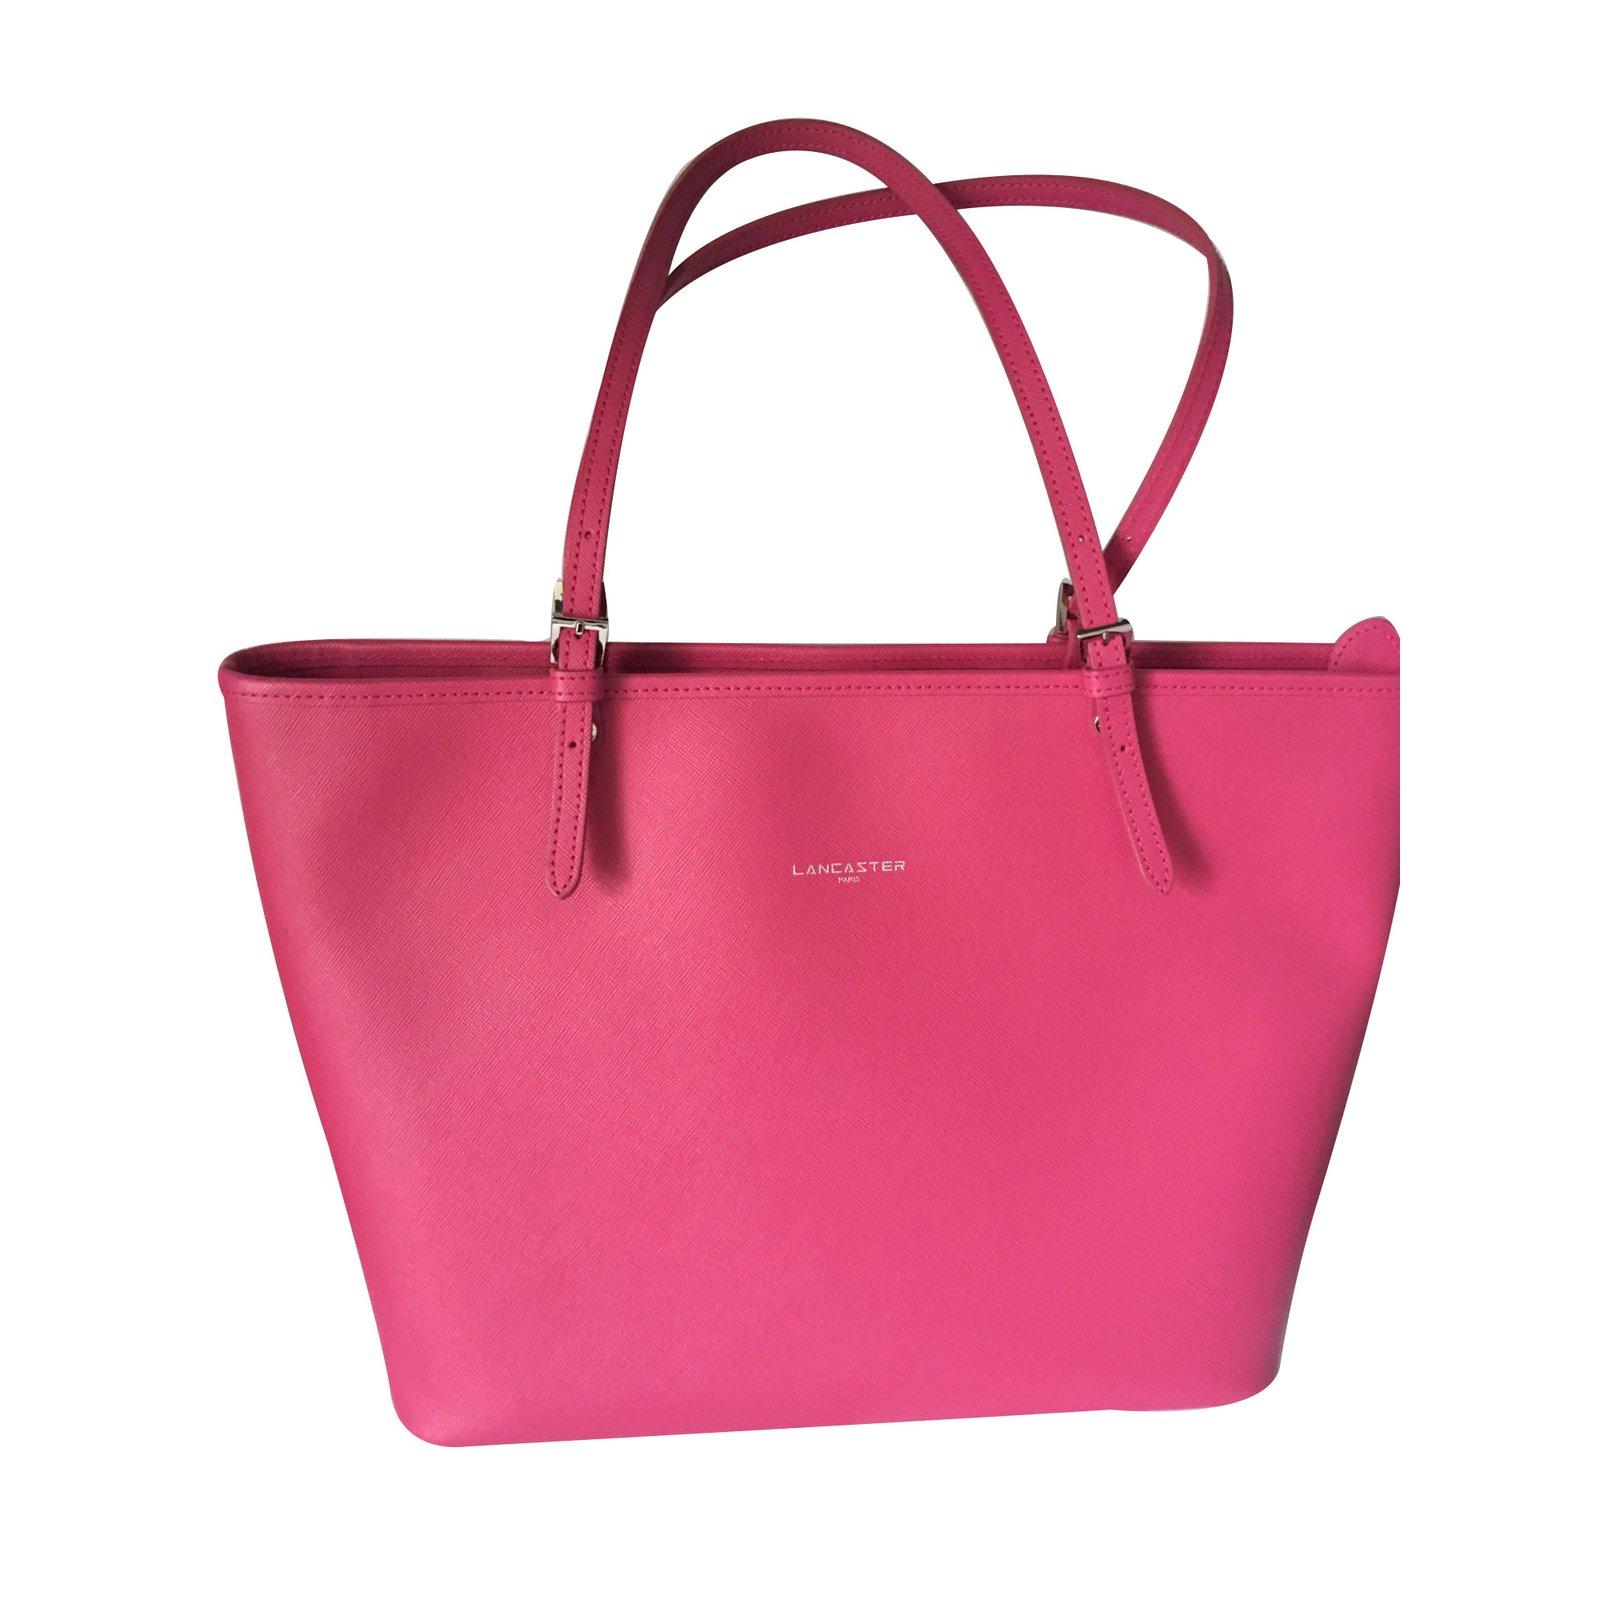 sacs main autre marque sacs main lancaster synth tique rose joli closet. Black Bedroom Furniture Sets. Home Design Ideas